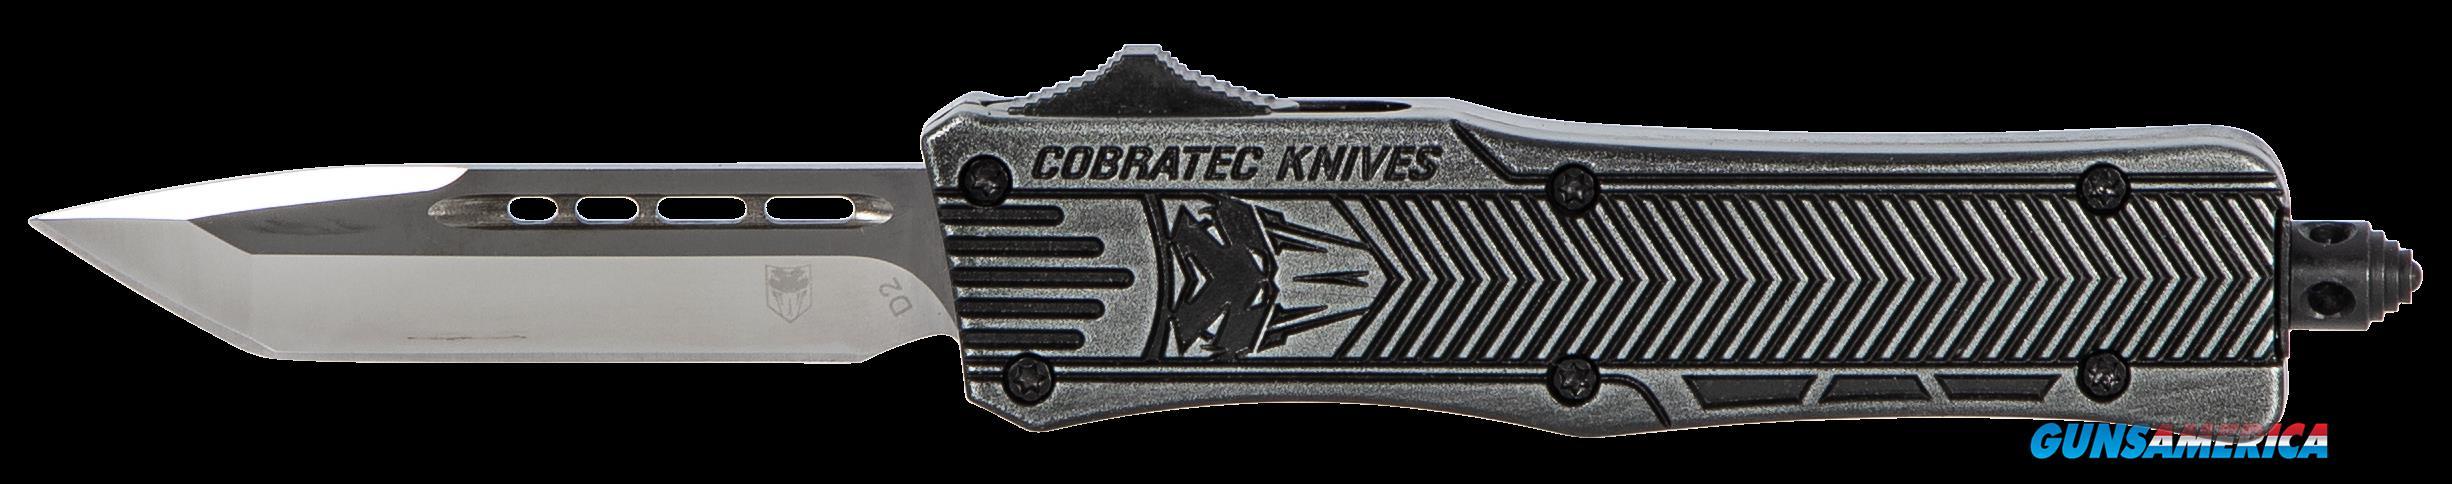 Cobra Tec Knives Llc Ctk-1, Cobra Sswctk1stns    Sml Ctk1 Tanto Stonewash  Guns > Pistols > 1911 Pistol Copies (non-Colt)